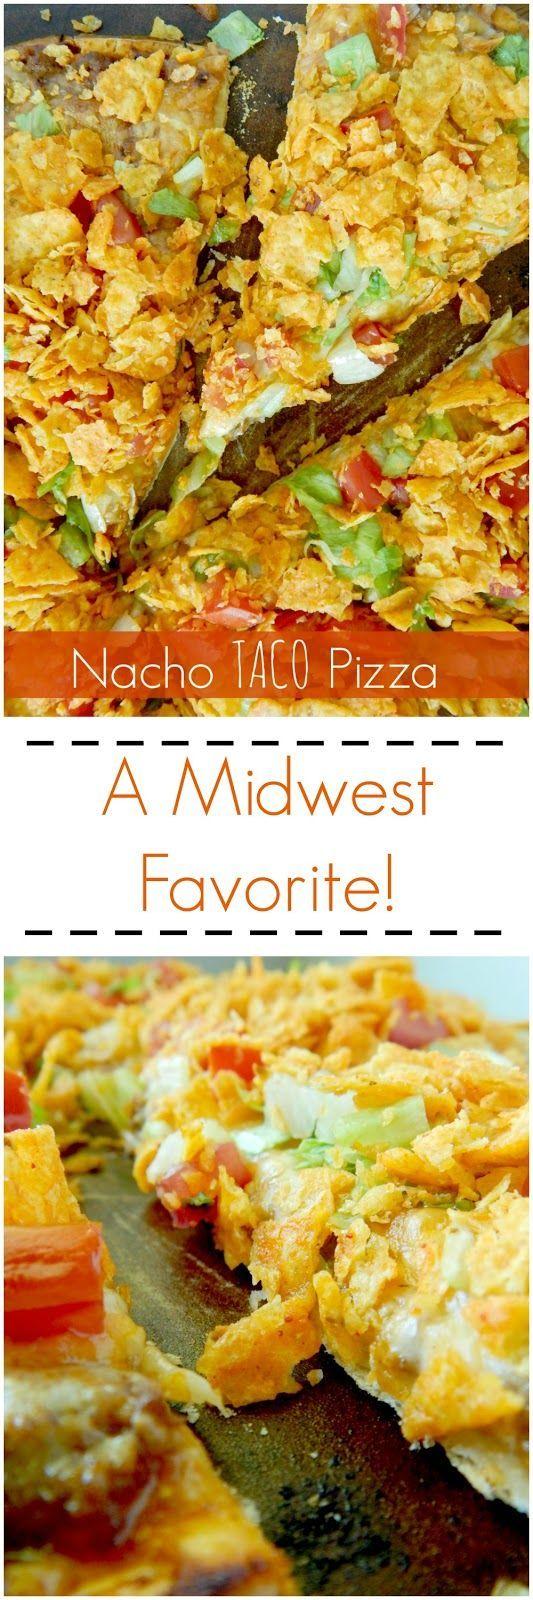 nacho taco pizza (http://sweetandsavoryfood.com)